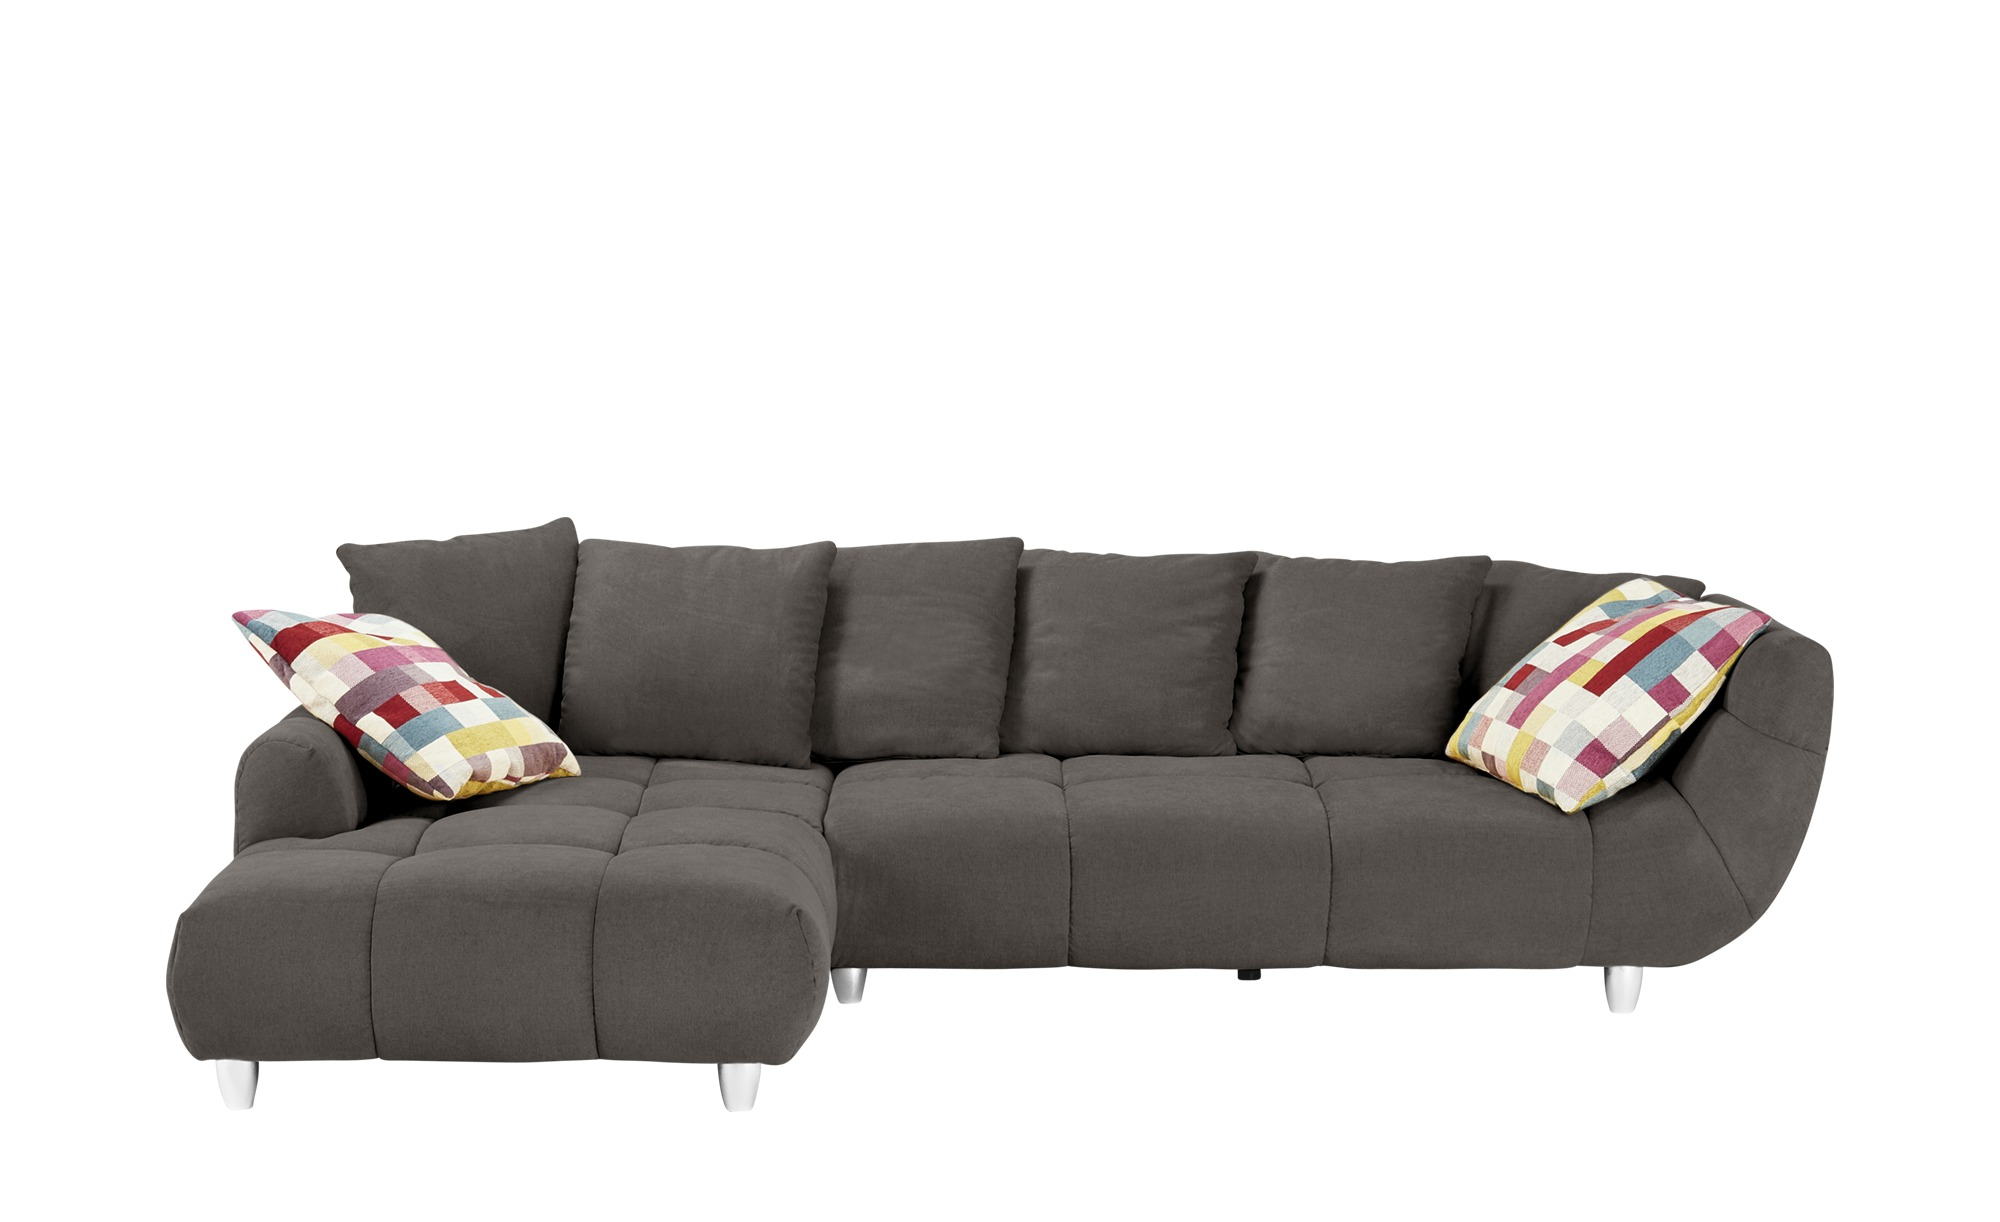 Ecksofa imke breite h he 90 cm grau online kaufen bei woonio for Ecksofa 1 90